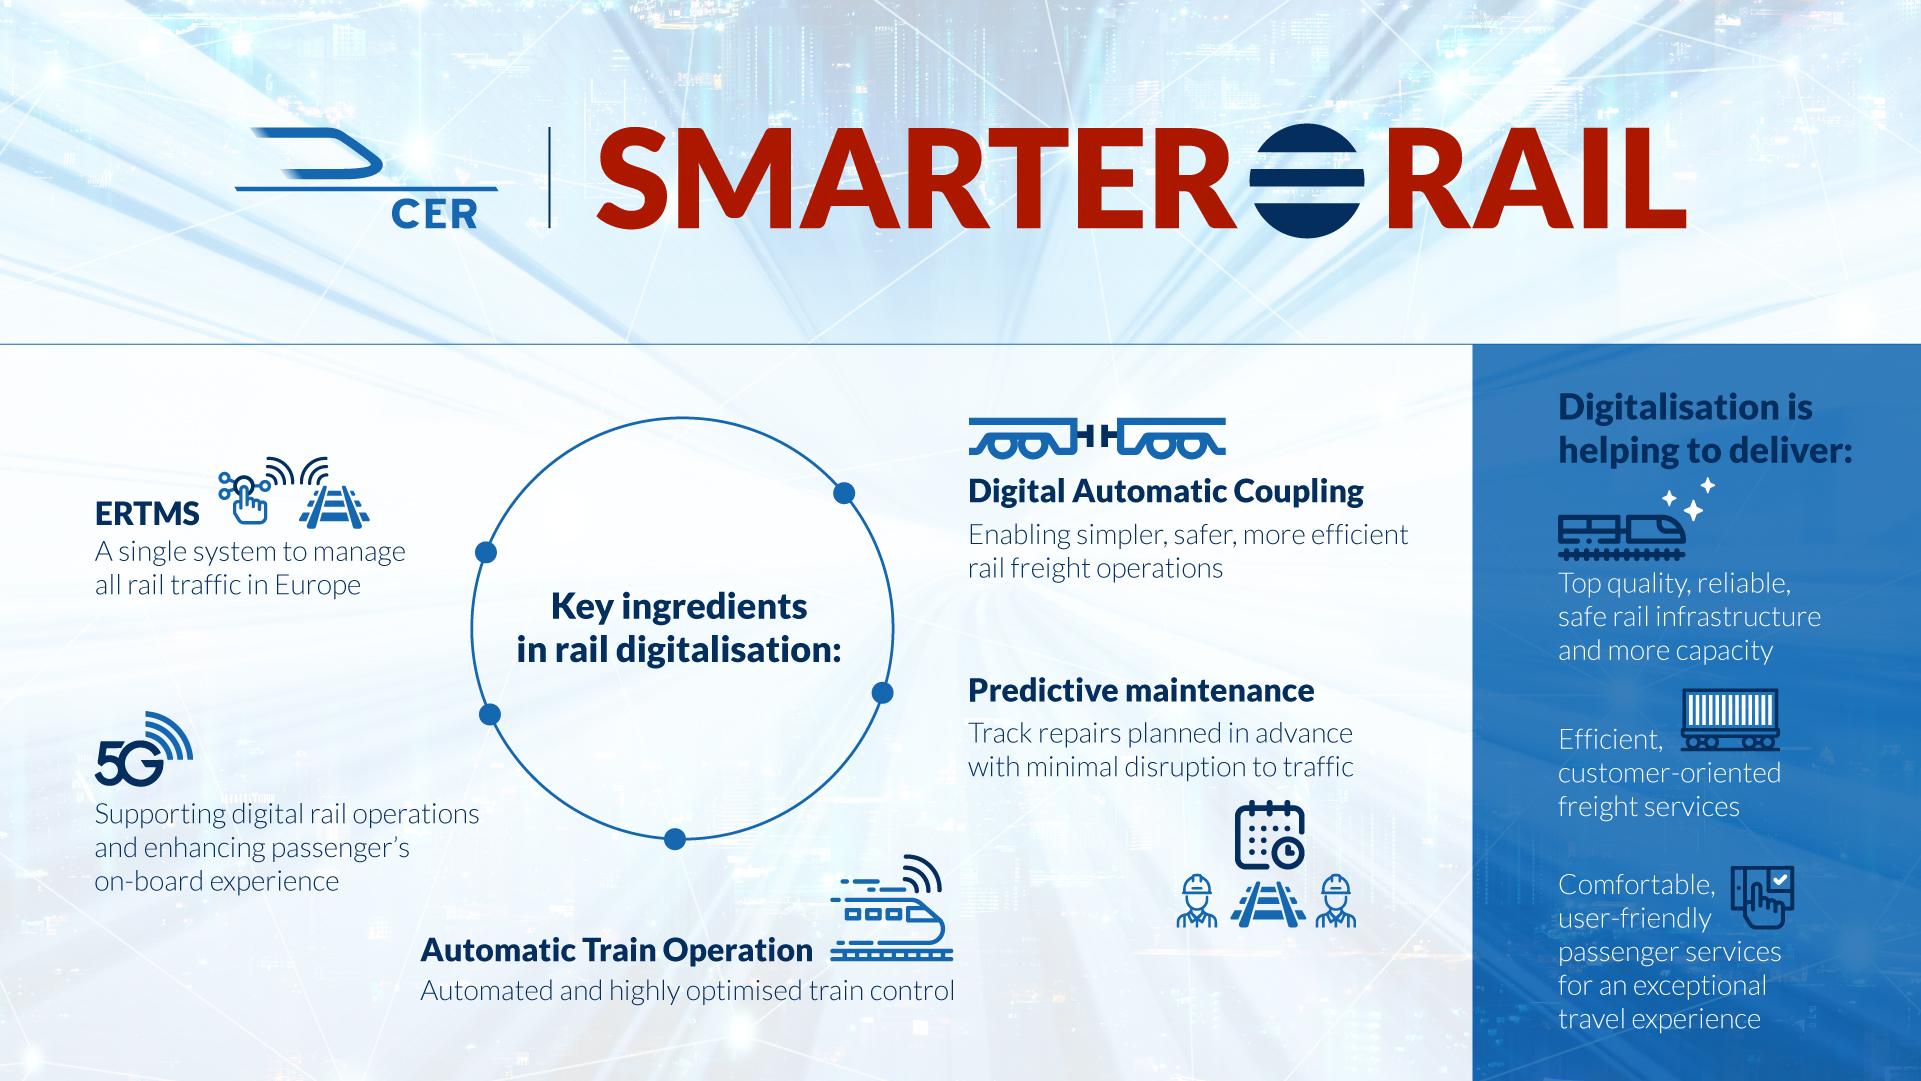 CER 2 SMARTER IS RAIL